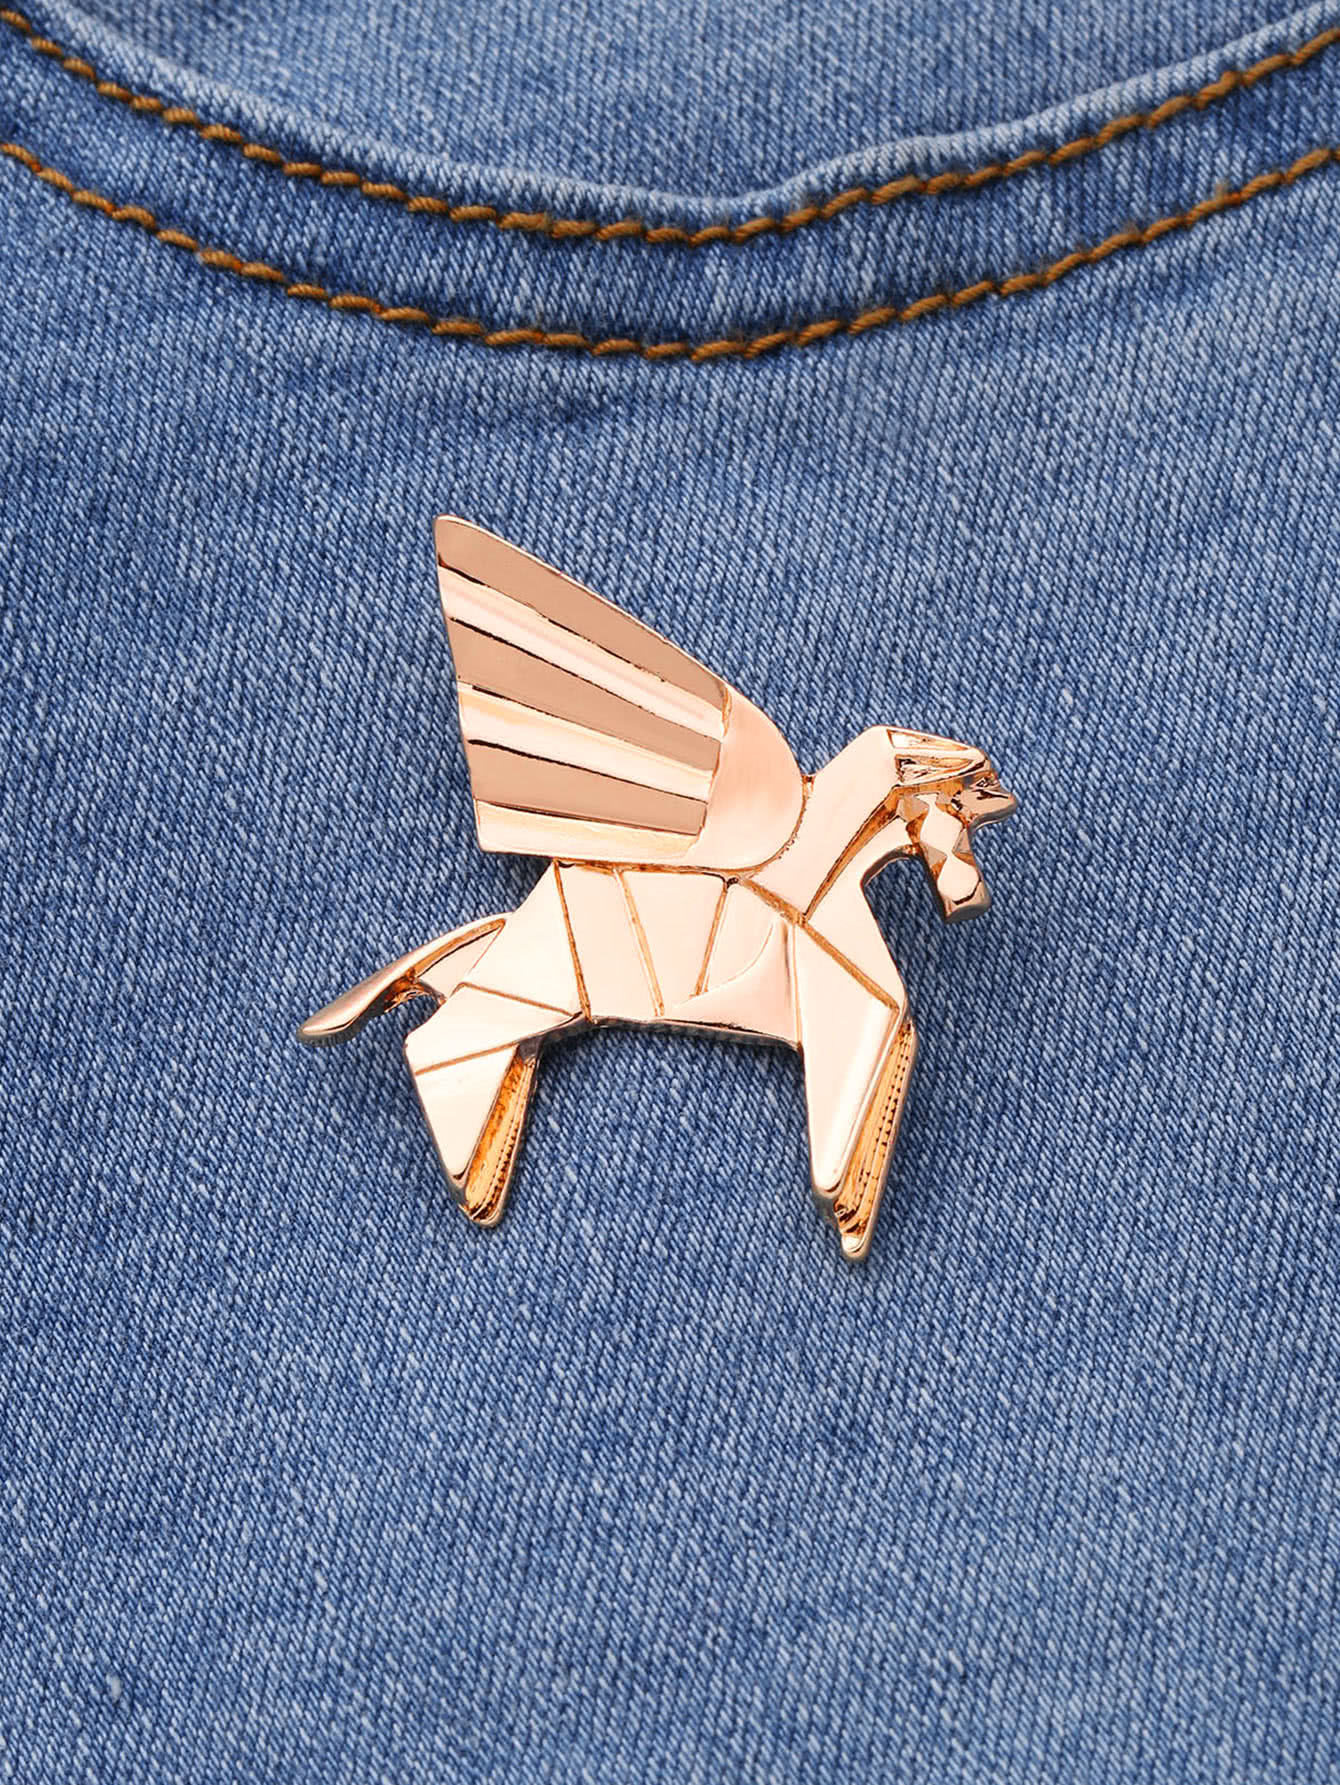 Horse Shaped Cute Brooch